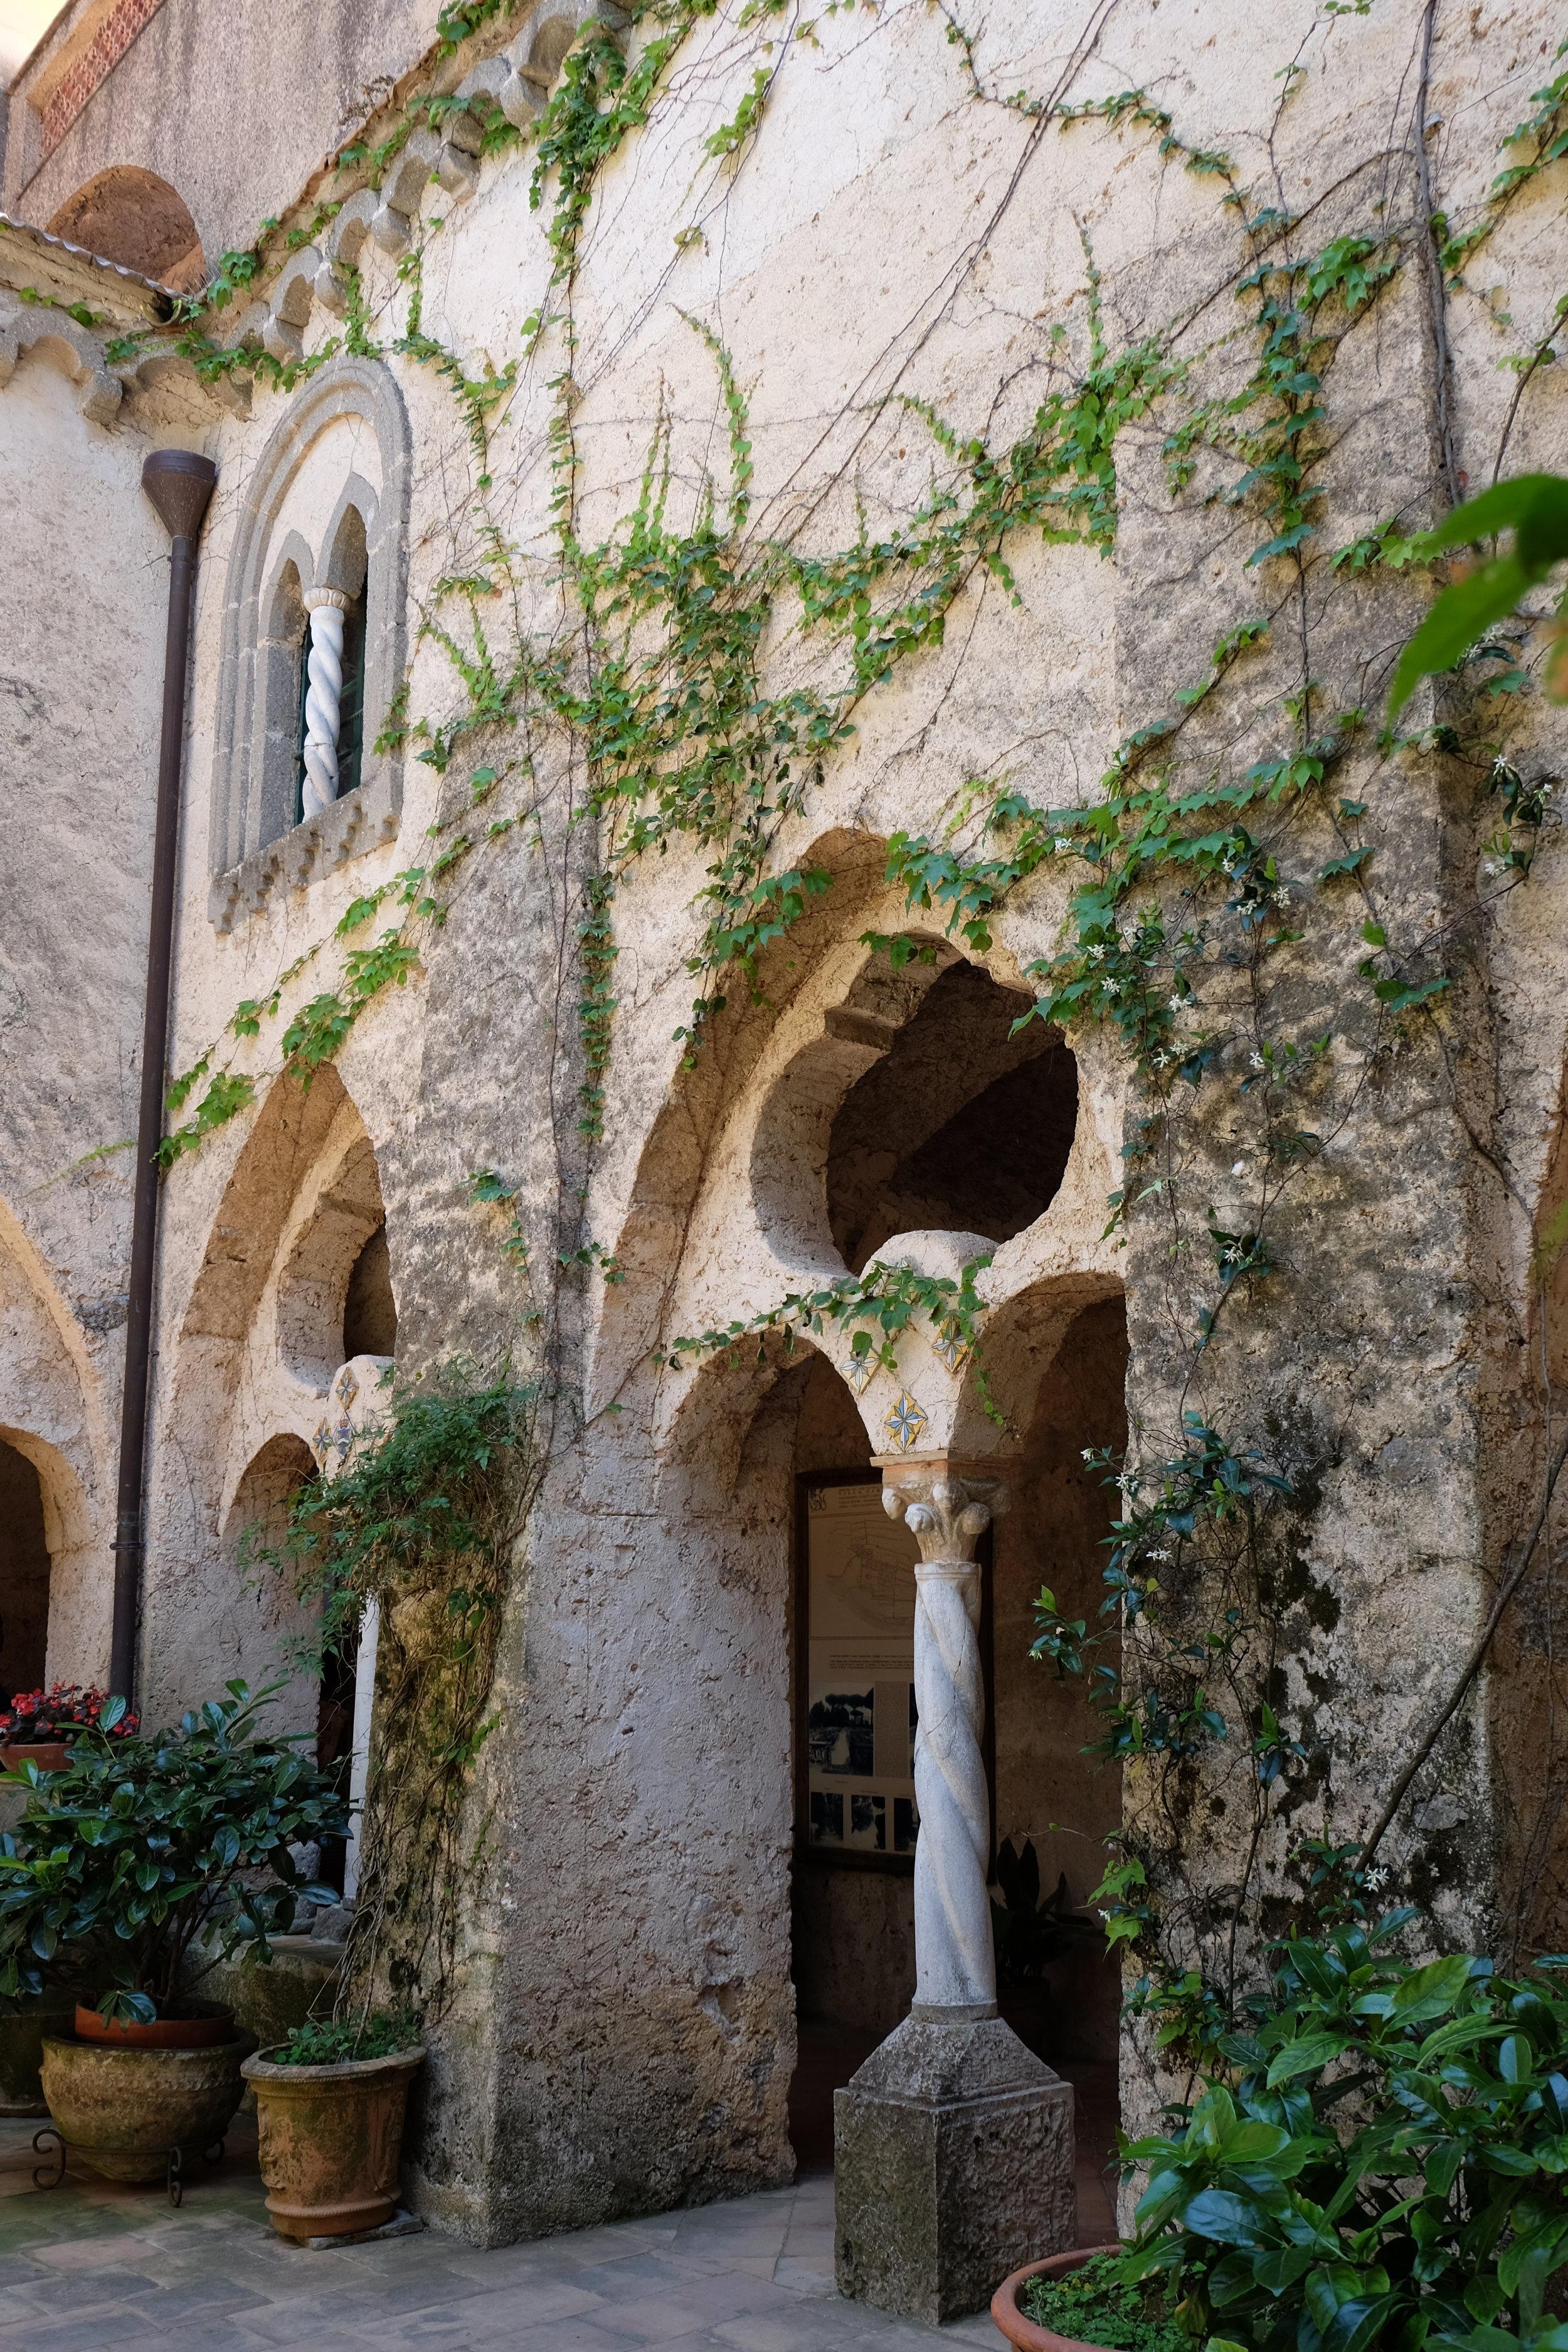 The romantic cloister.